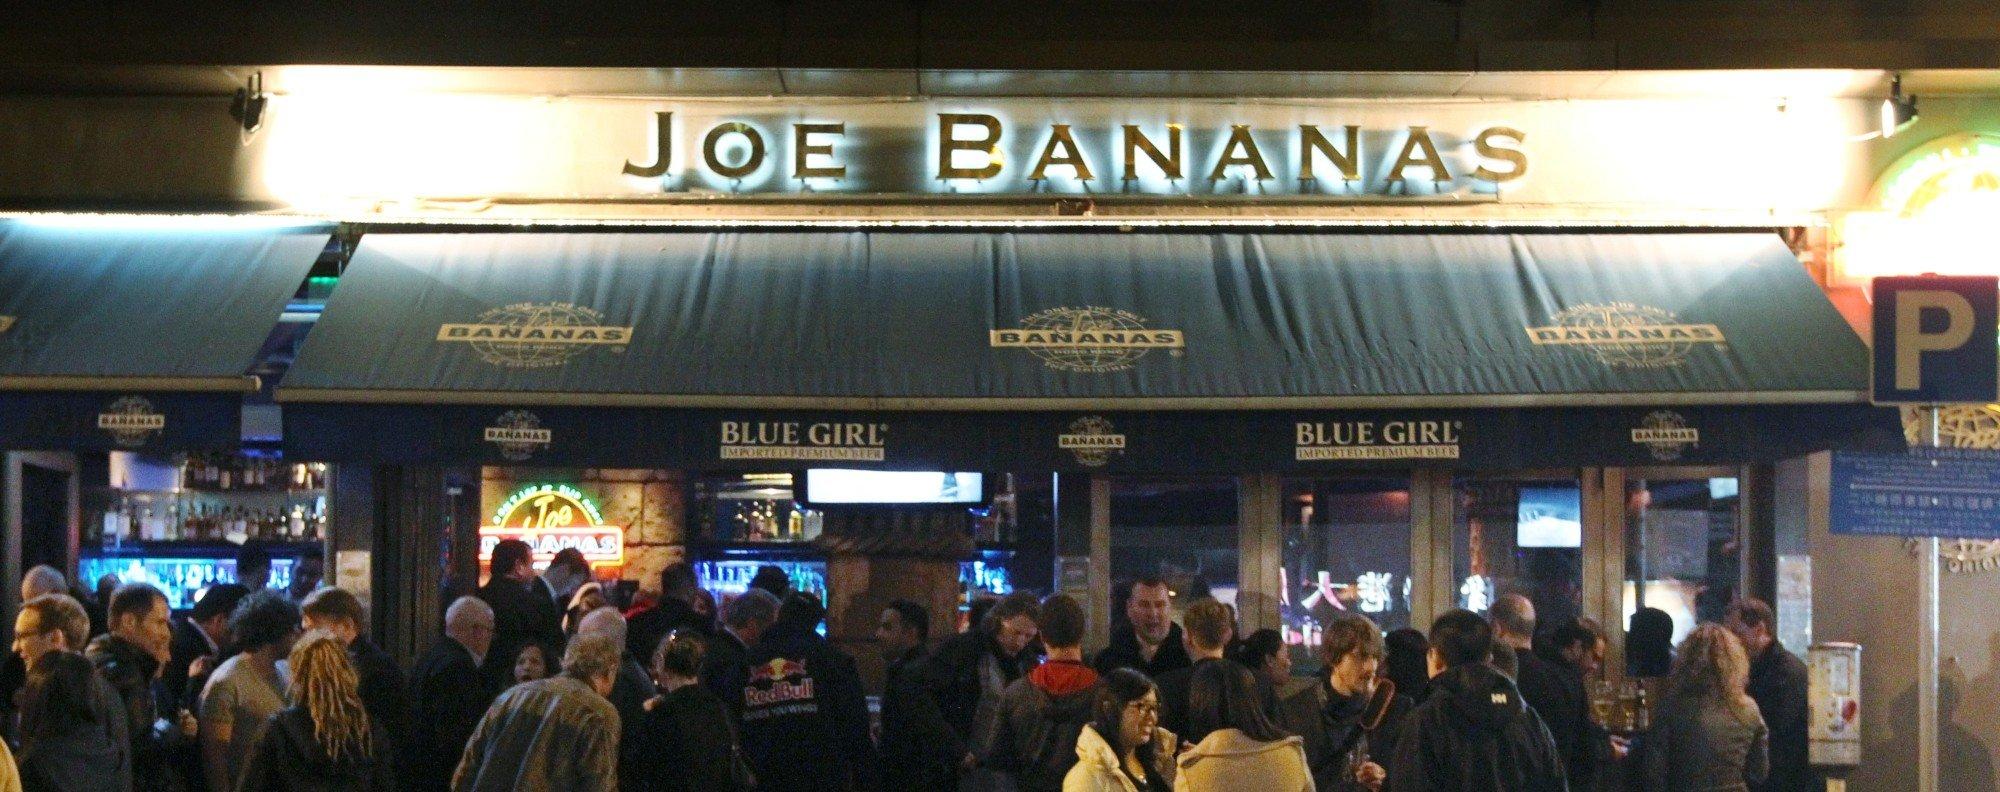 Customers at Joe Bananas on the night it closed in 2014. Picture: Sam Tsang